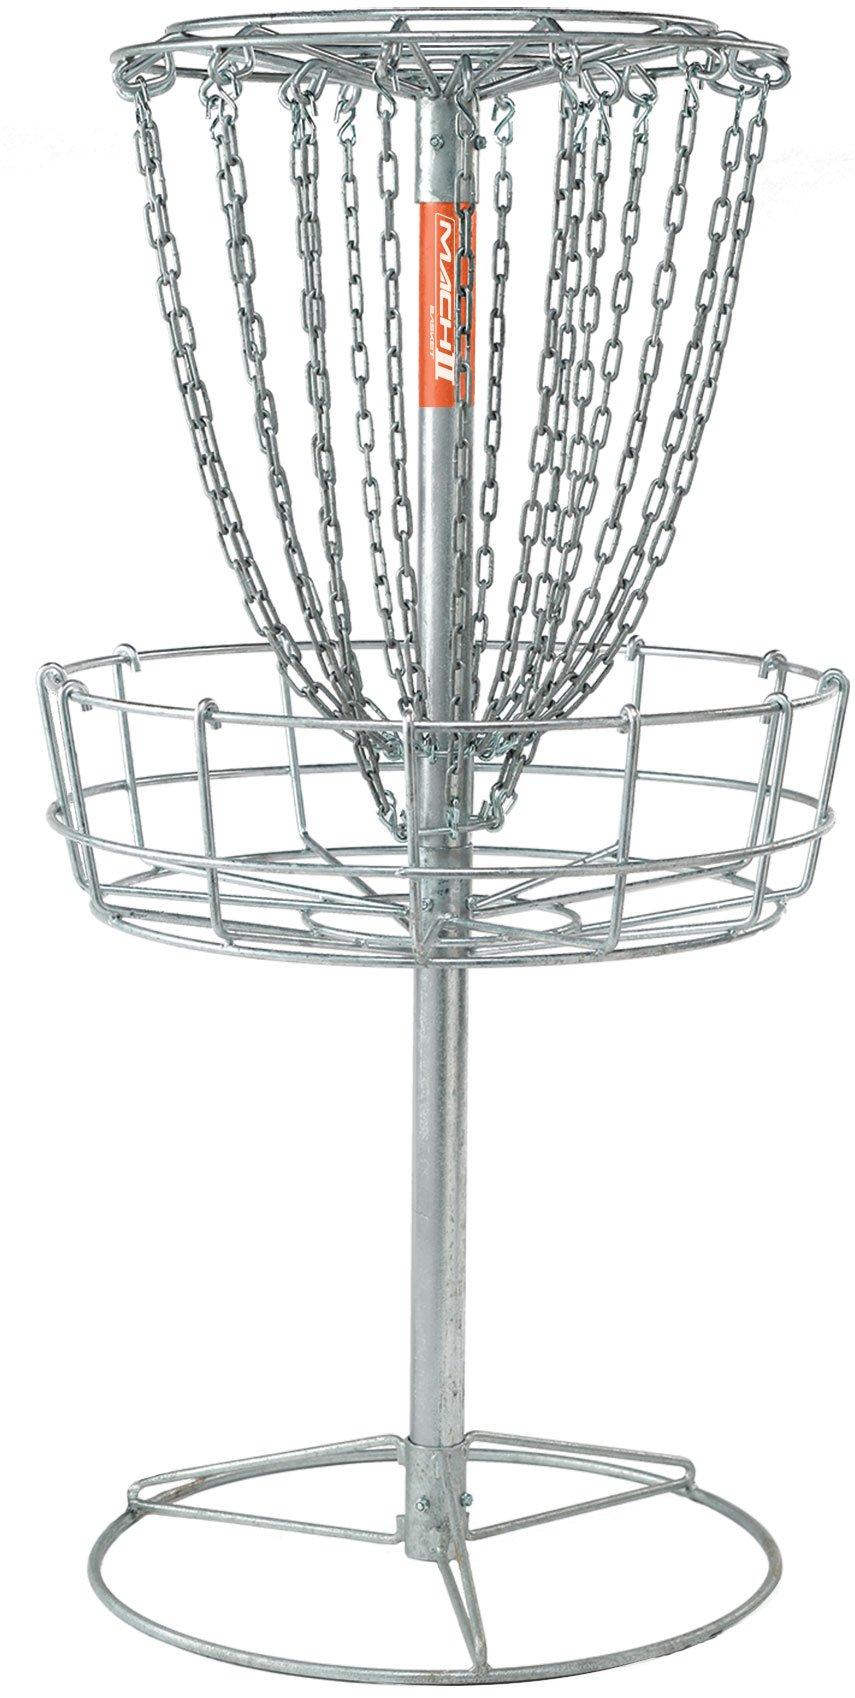 DGA Mach 2 Disc Golf Basket - Portable Heavy-Duty Outdoor Galvanized Steel Disc Golf Target by DGA